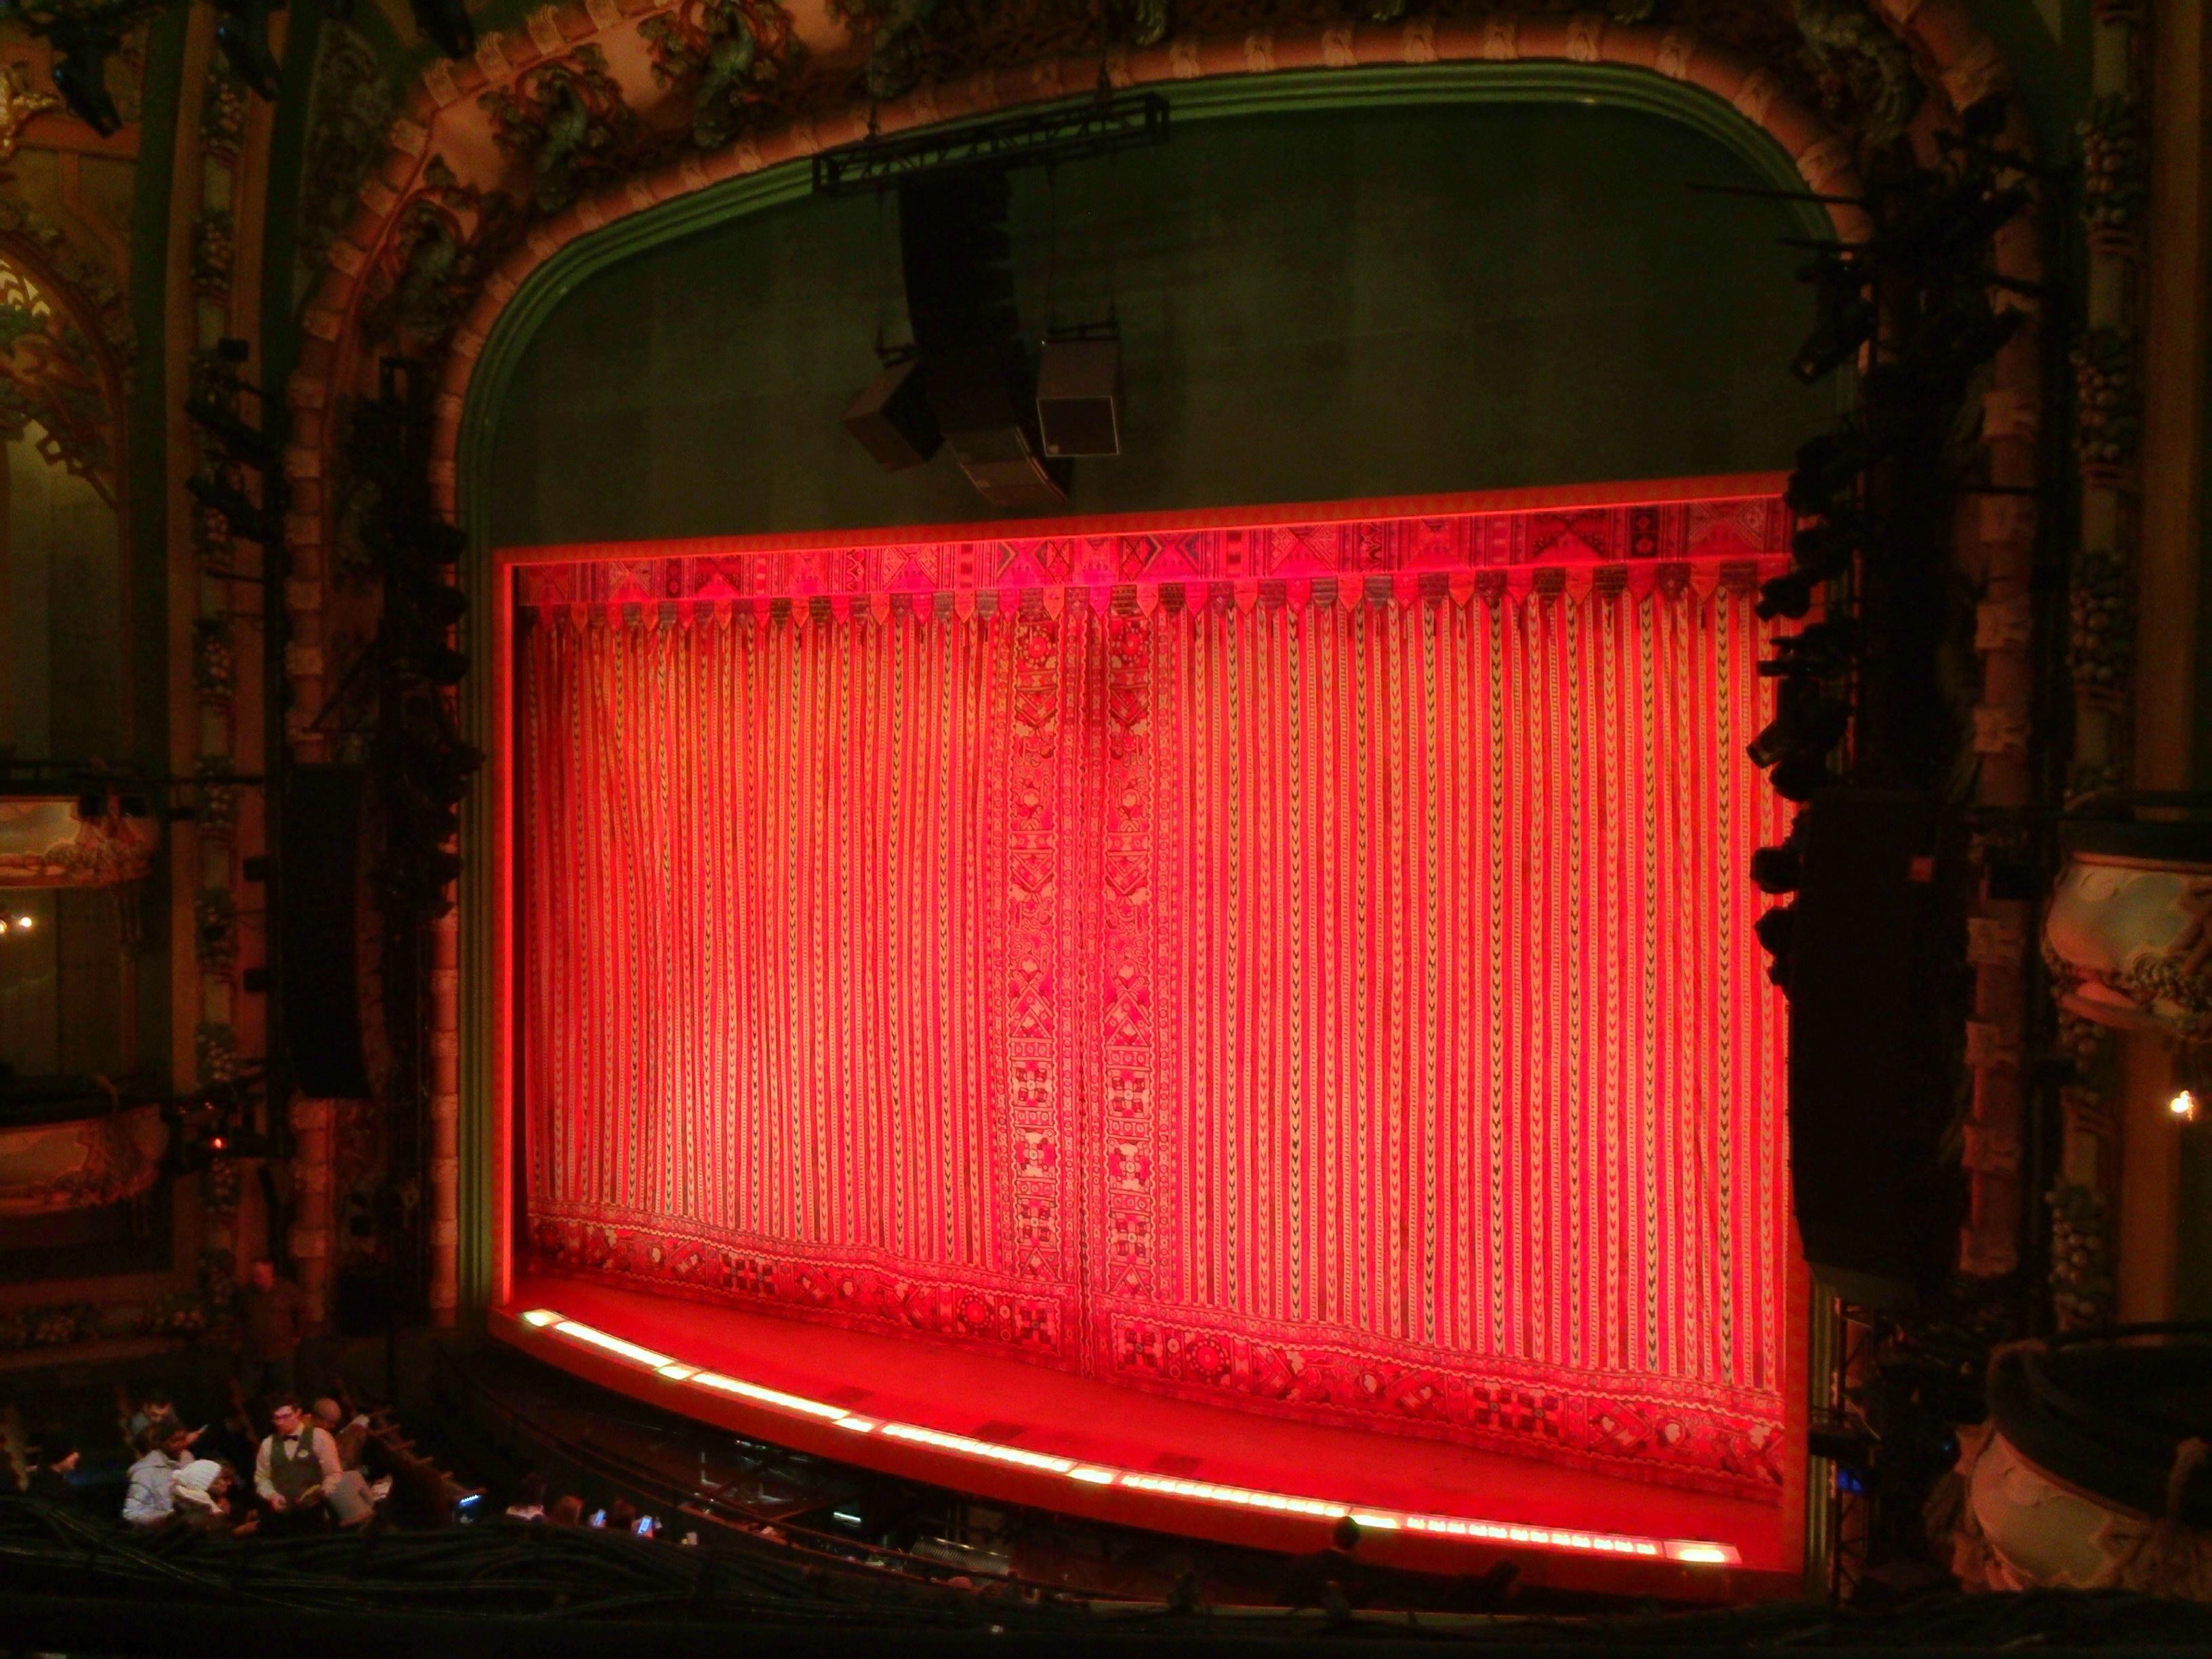 New Amsterdam Theatre Section Mezzanine R Row CC Seat 14